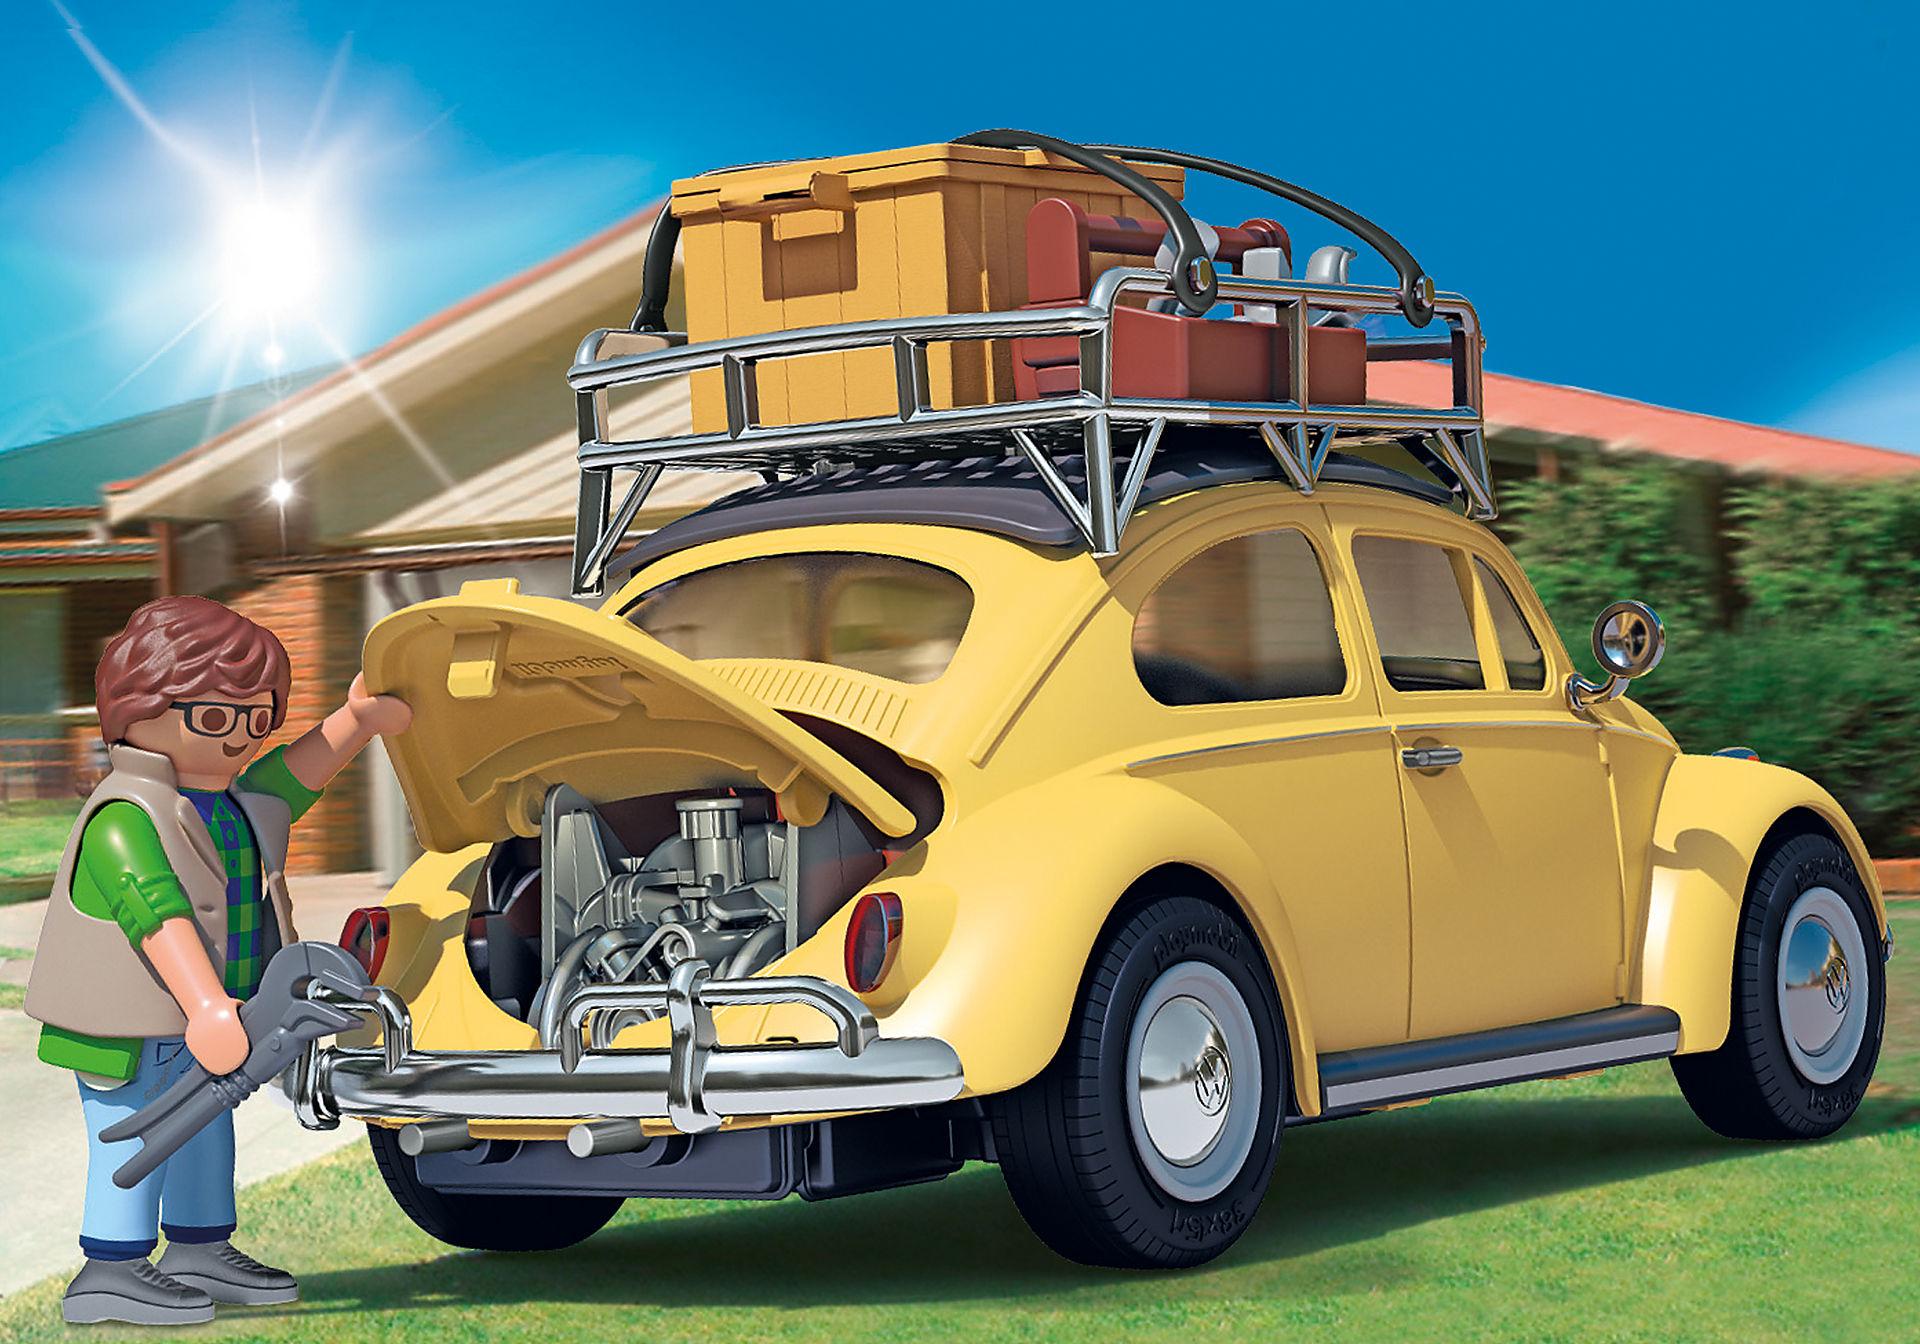 70827 Volkswagen Σκαραβαίος - Special Edition zoom image6